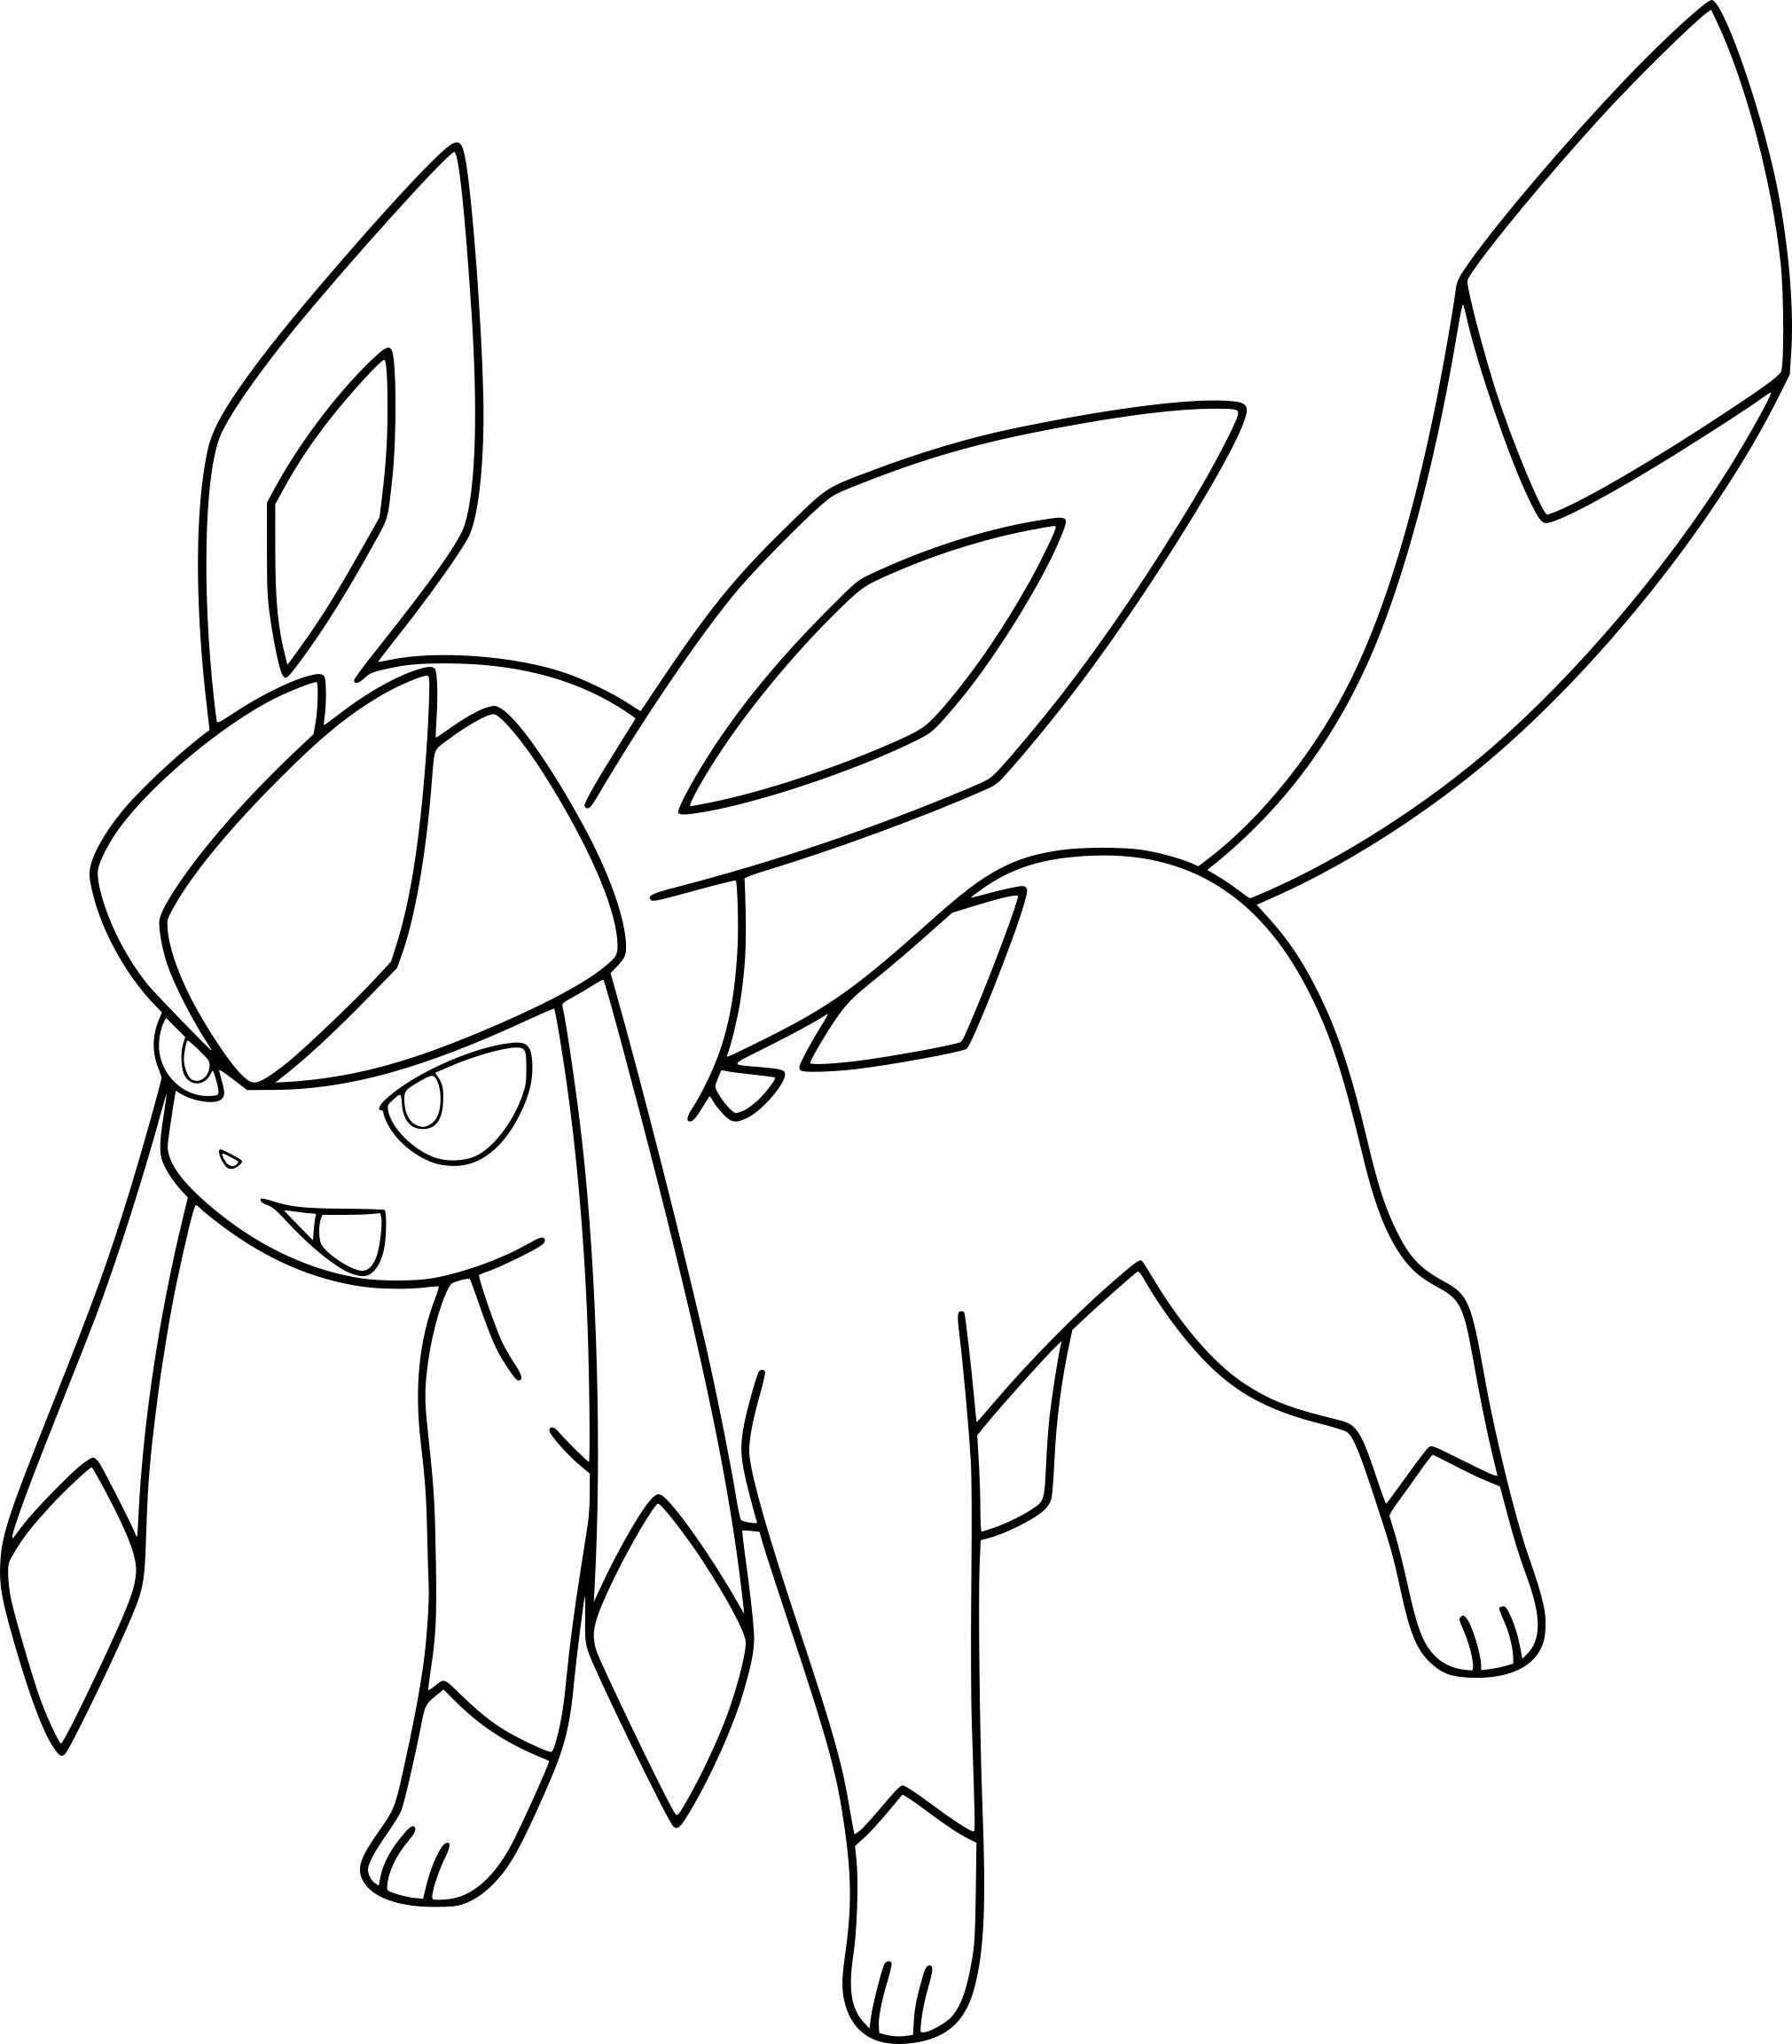 2021x2305 Pokemon Coloring Pages Eevee Evolutions Together Best Of Eevee